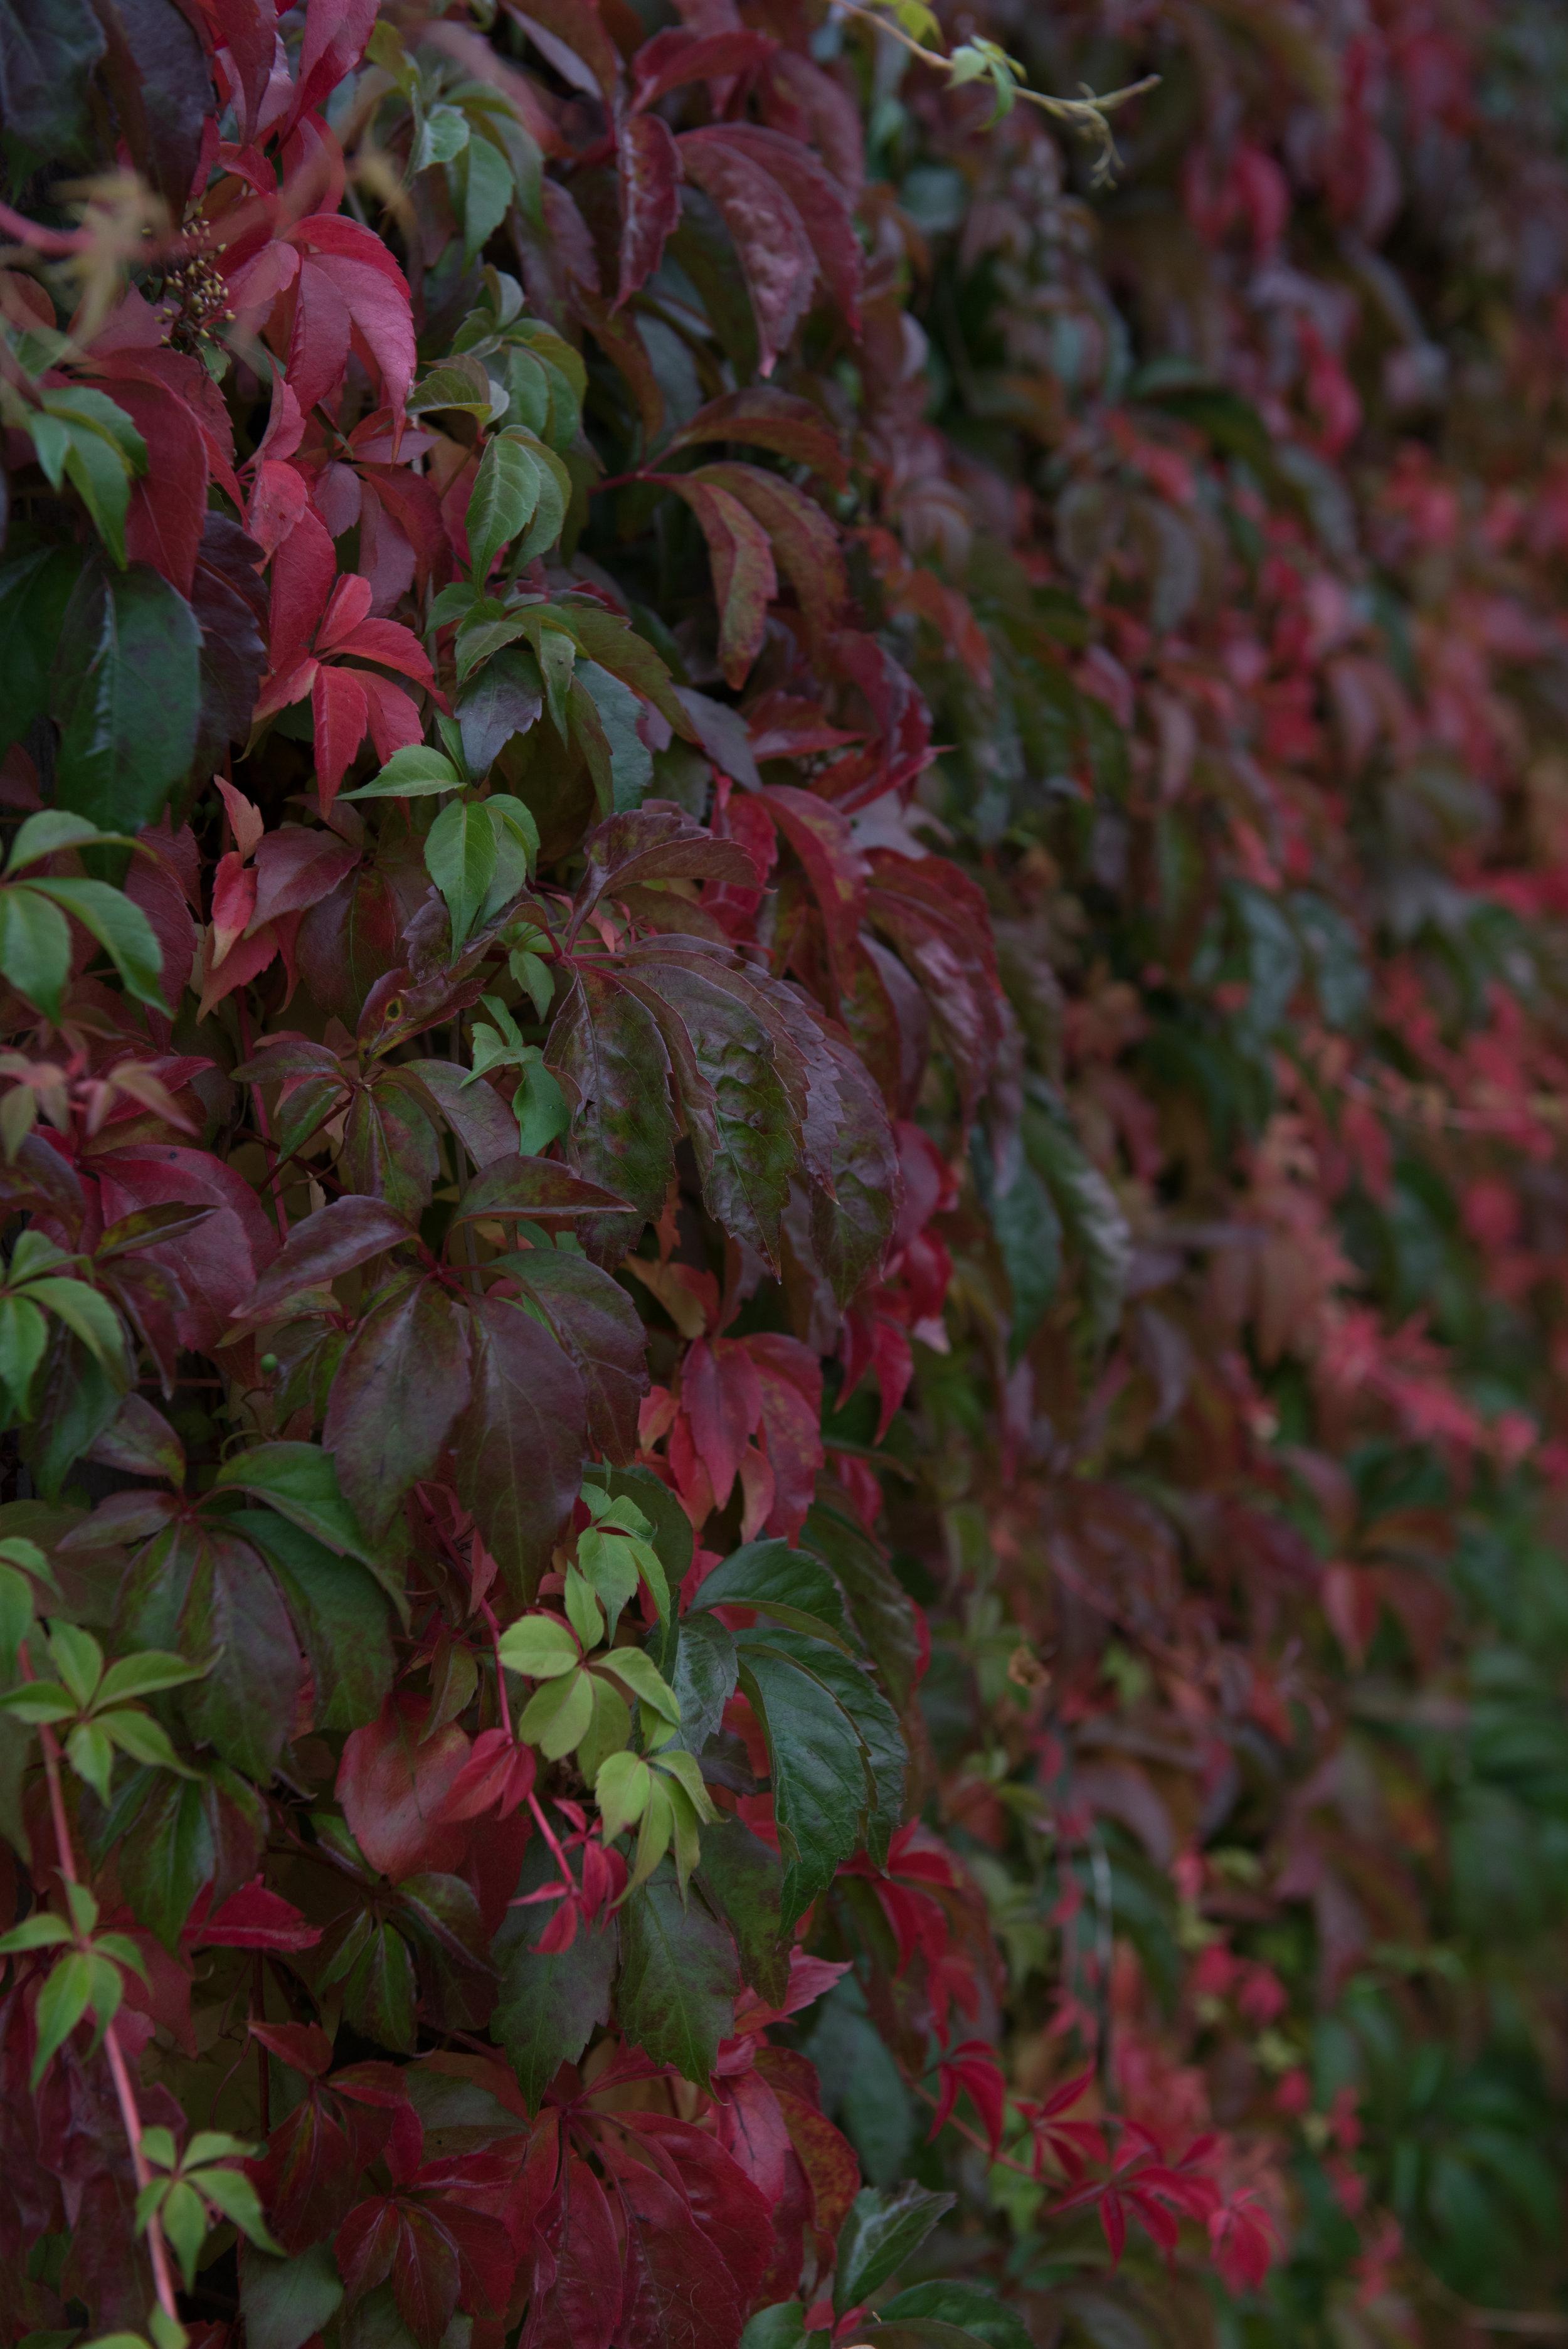 Lottas trädgård (1 of 23).jpg